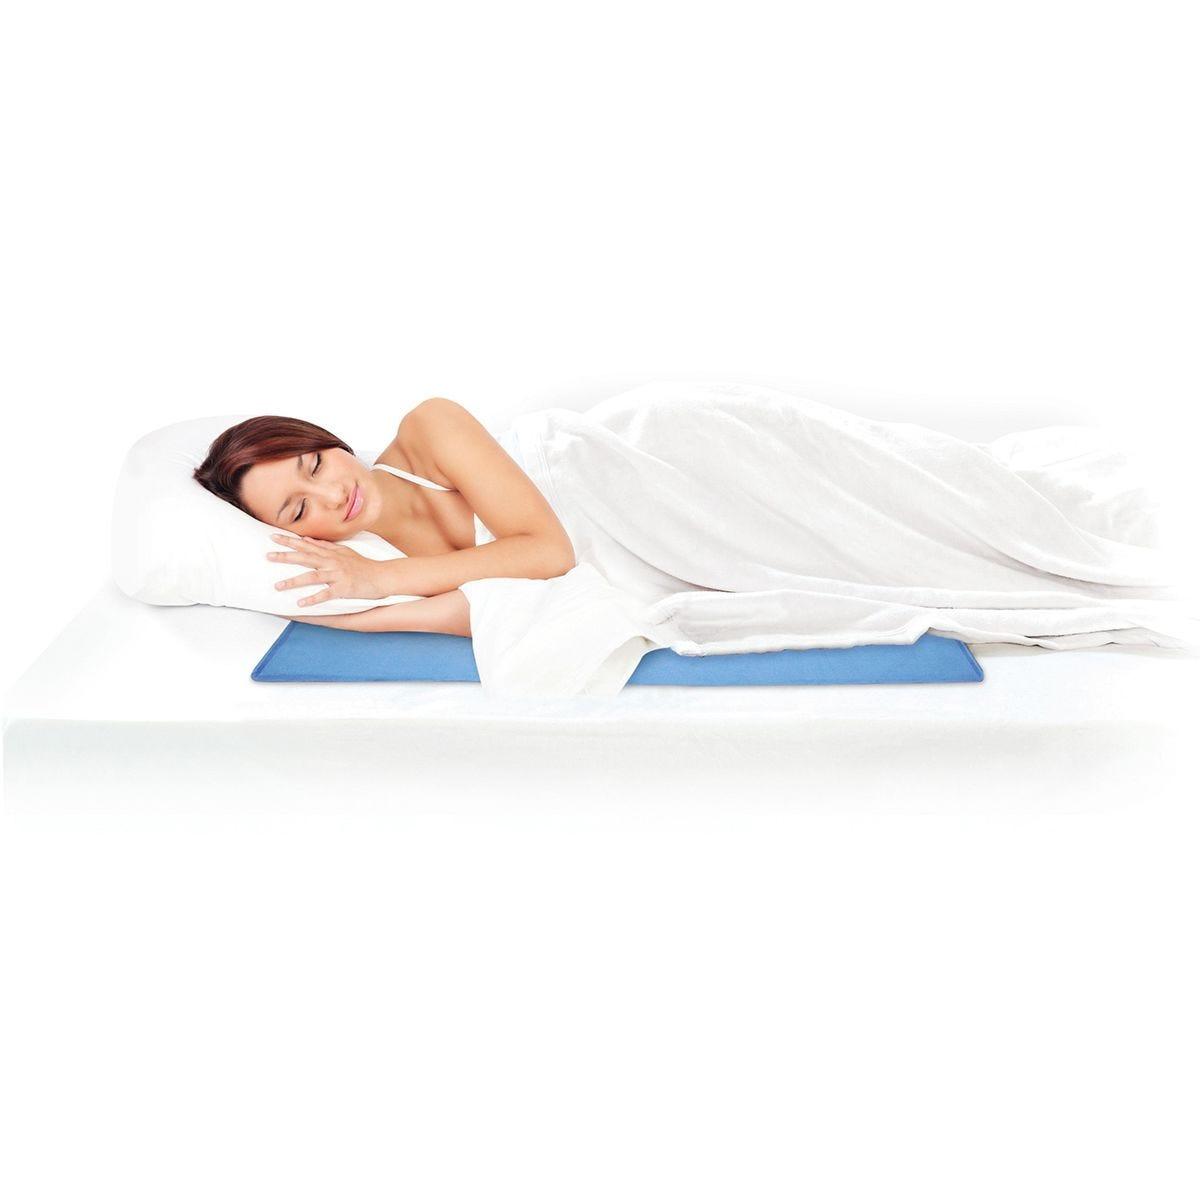 Lifemax Cool Single Bed Pad